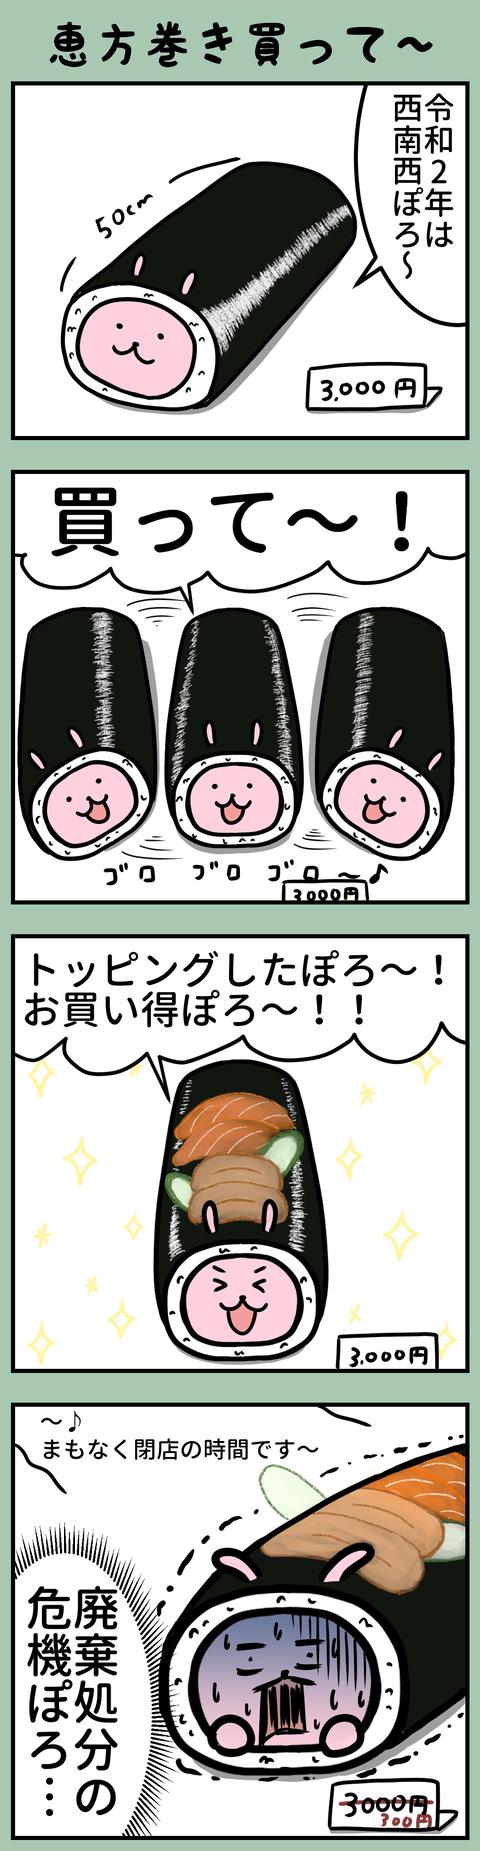 manga-yuzuporo85-1